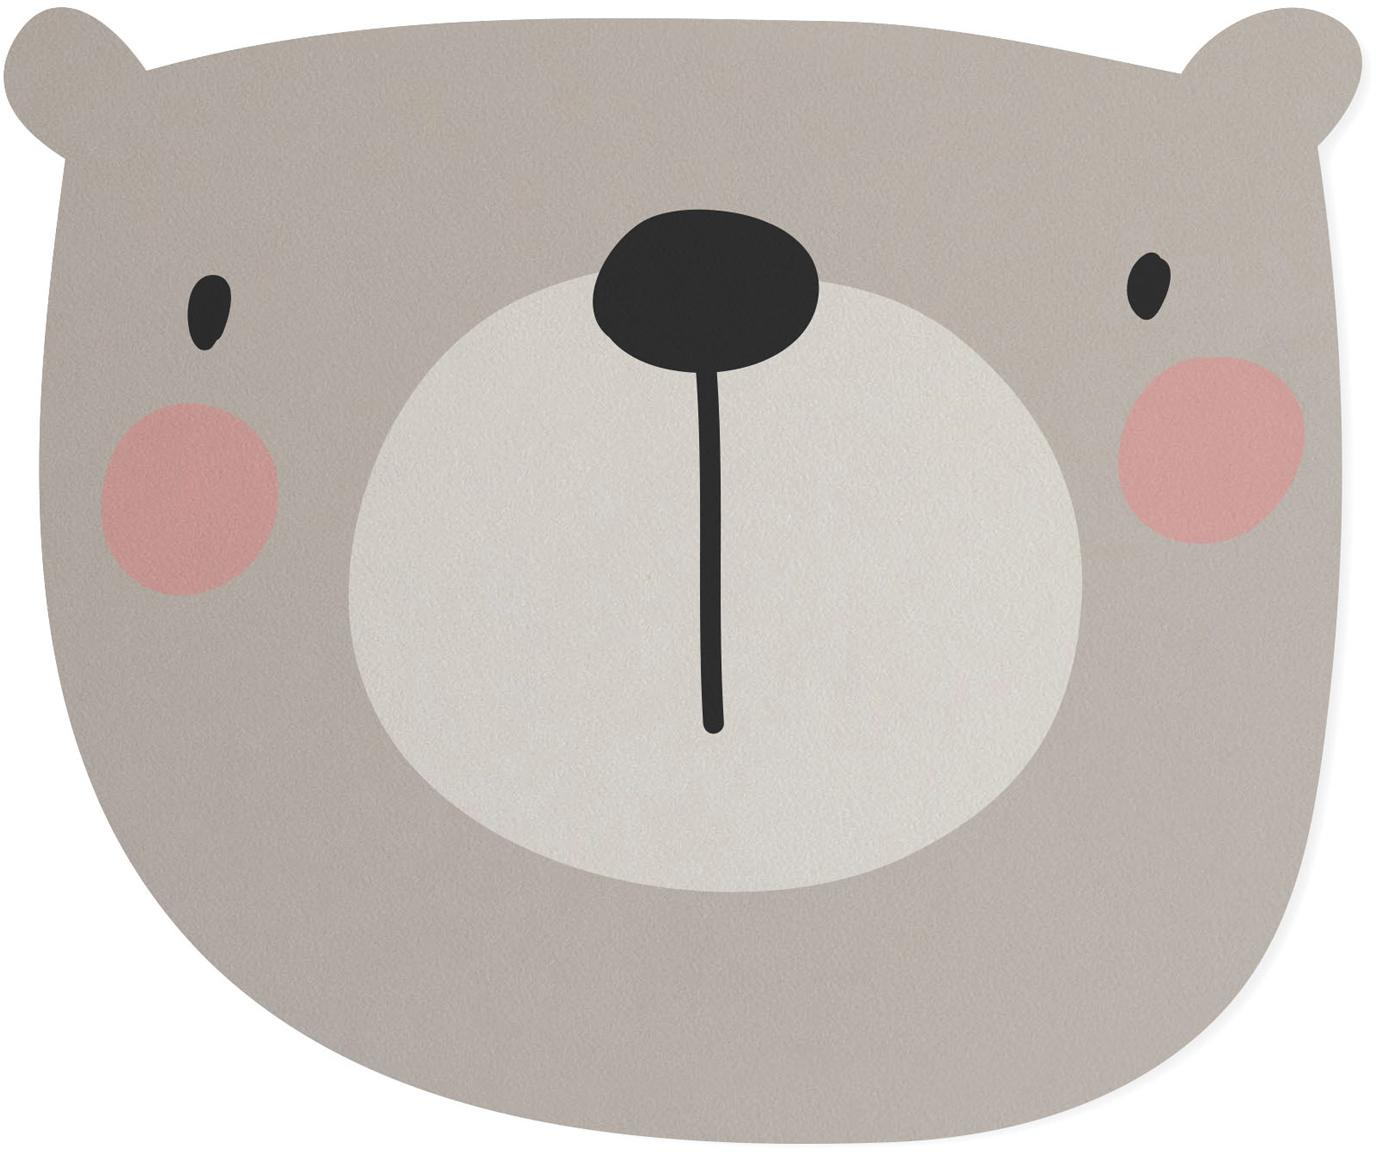 Protector de escritorios Bear, Fibras de yute y resina, Gris, beige, rosa, negro, An 35 x L 55 cm